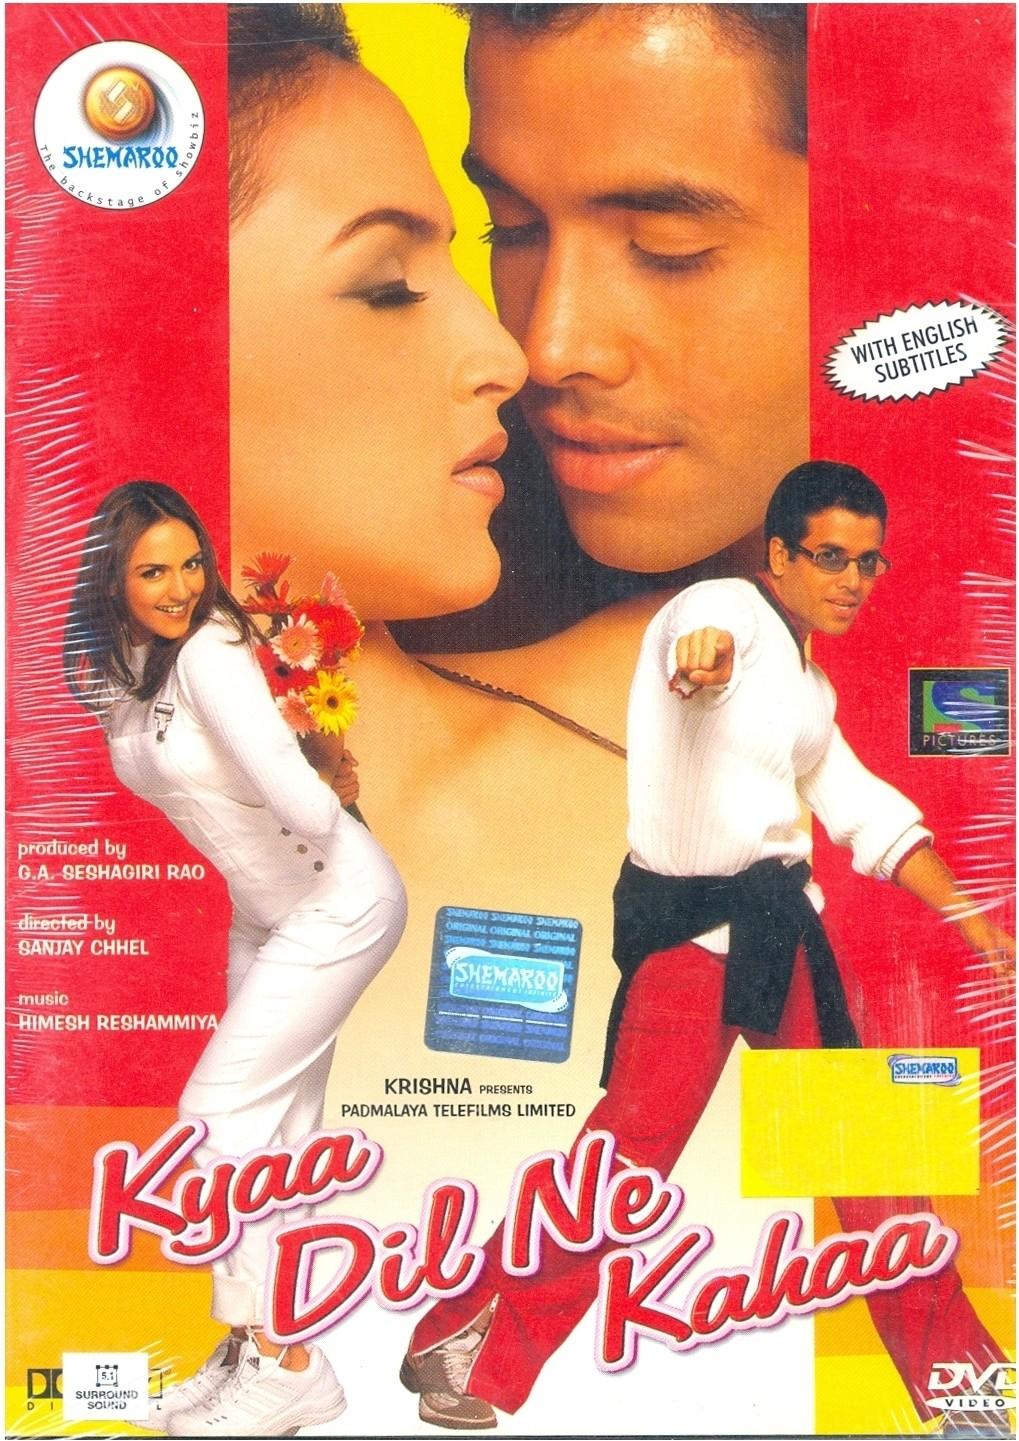 Kyaa Dil Ne Kahaa (2002) Hindi 720p WEB-DL 1.2GB | 400MB Download